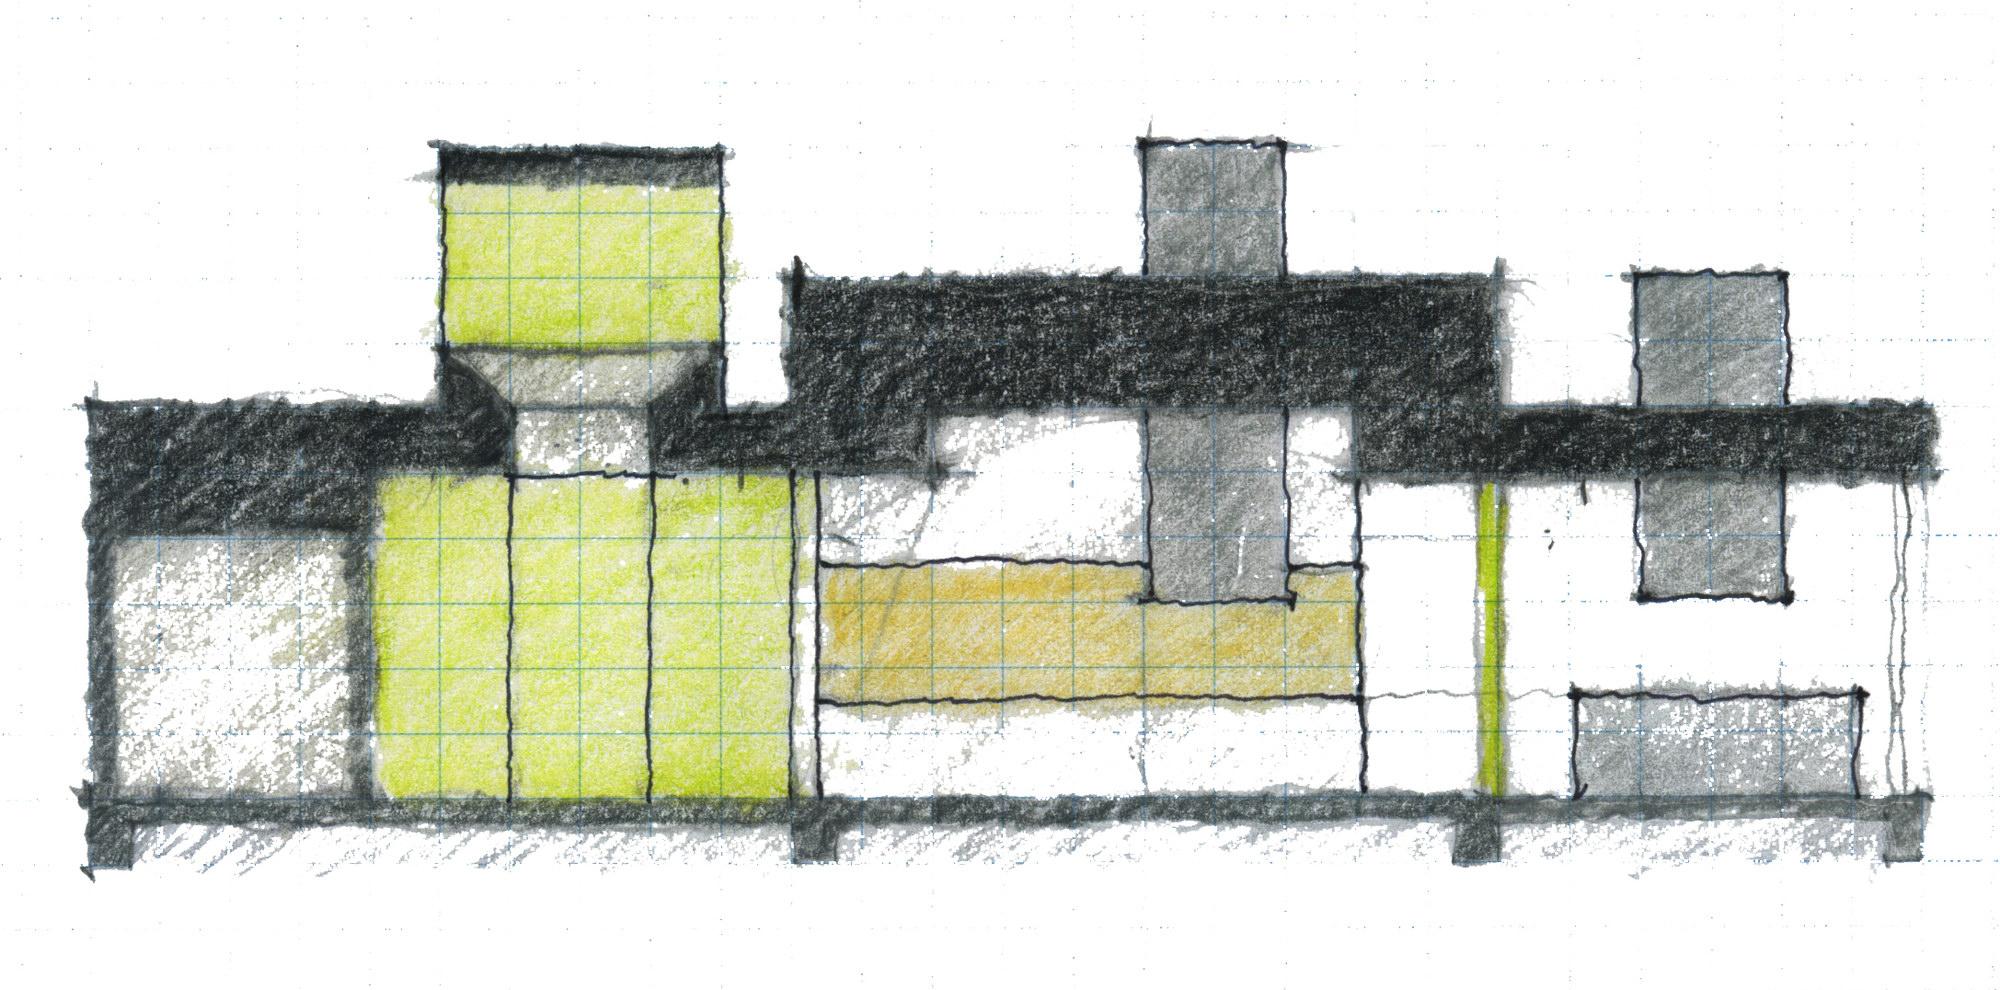 Rio Vista Residence by Buchanan Architecture